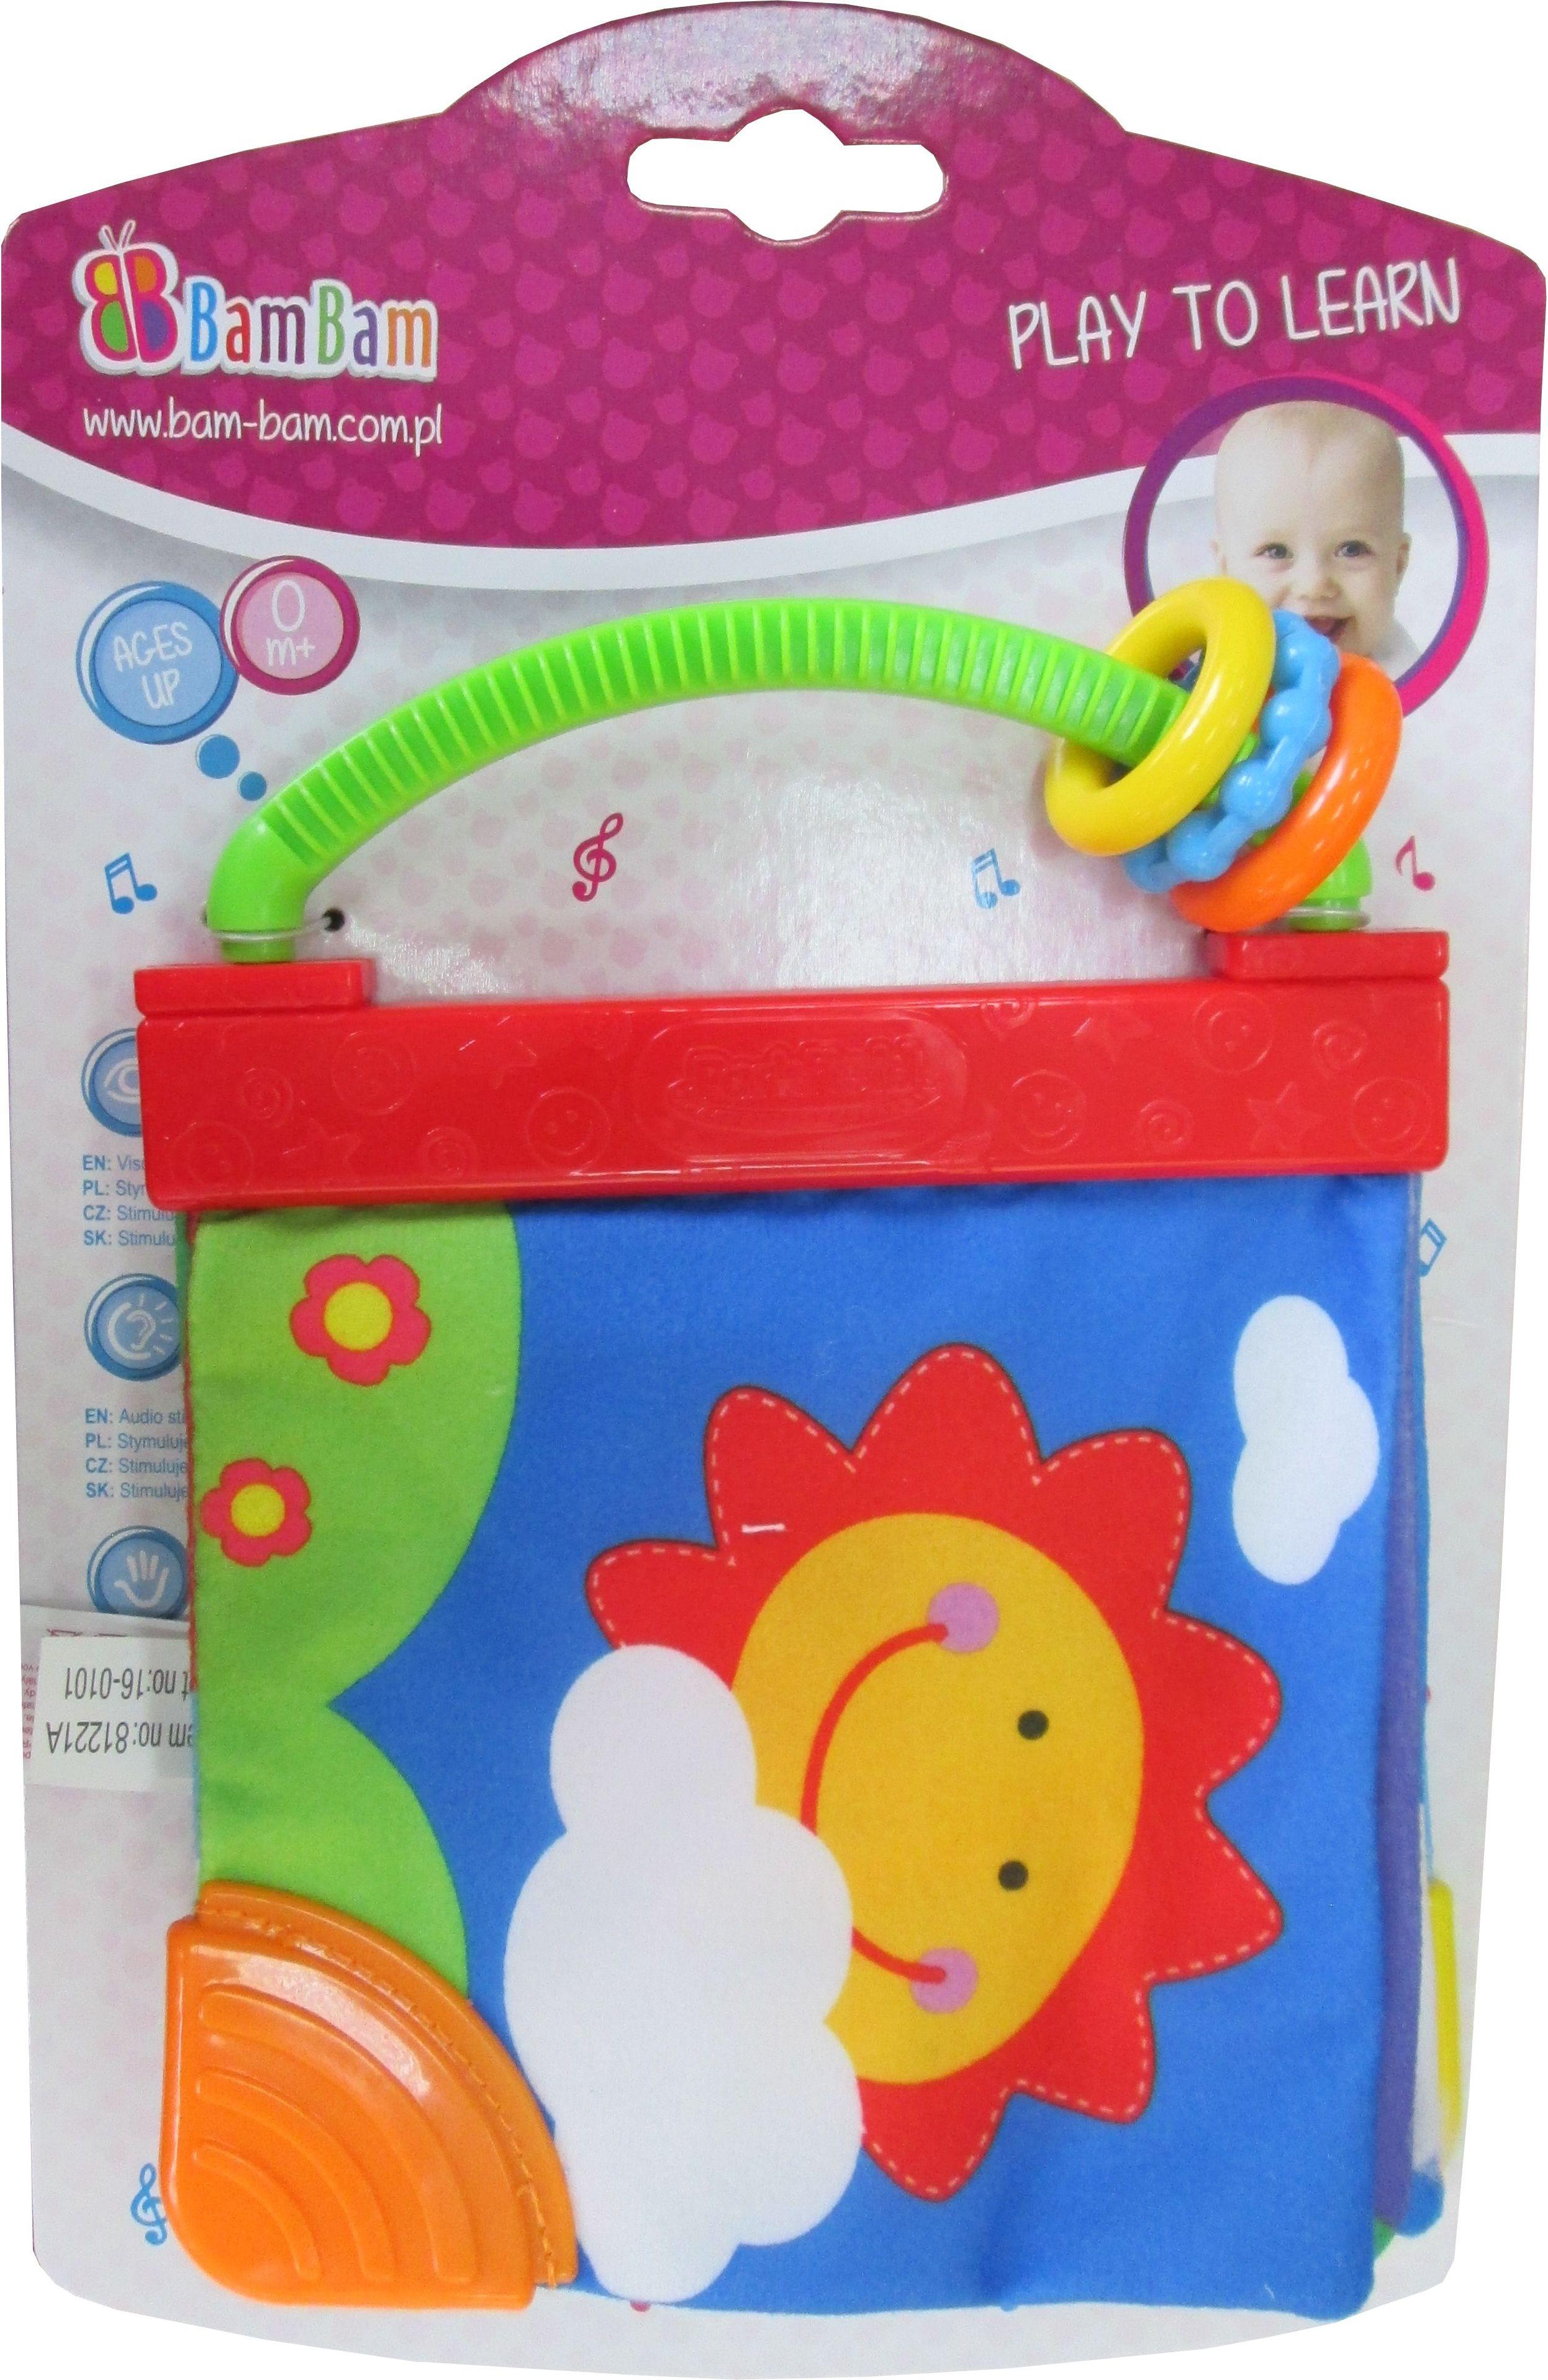 BamBam Bam Bam Booklet Sun 377137 - WIKR-1036921